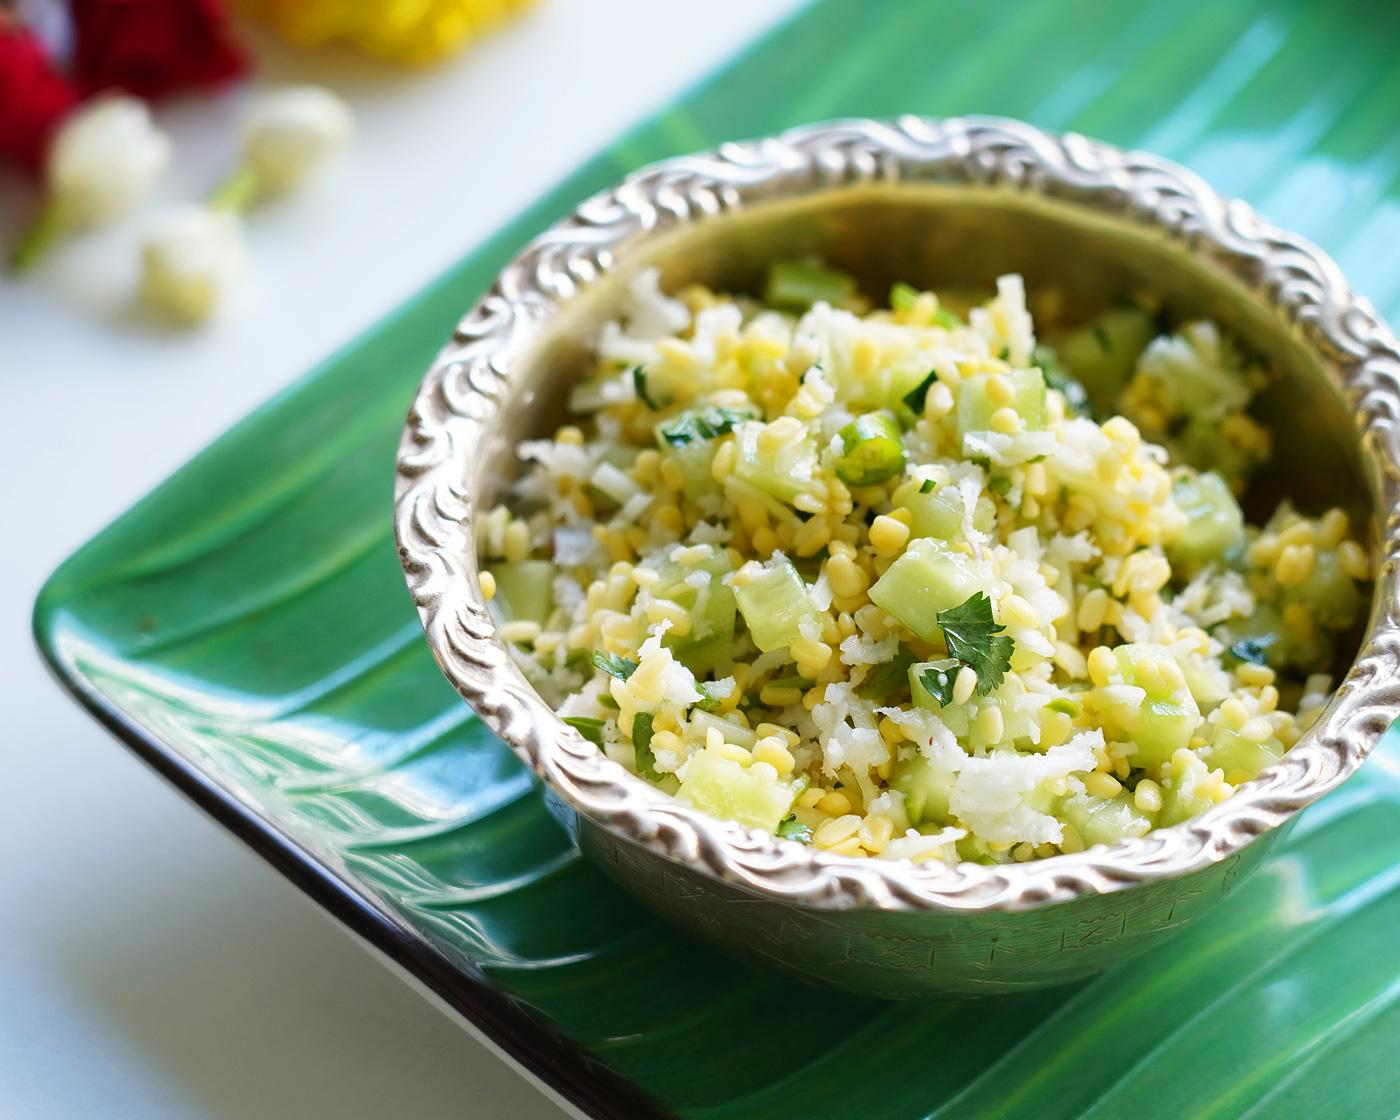 Cucumber kosambari recipe, Vada pappu